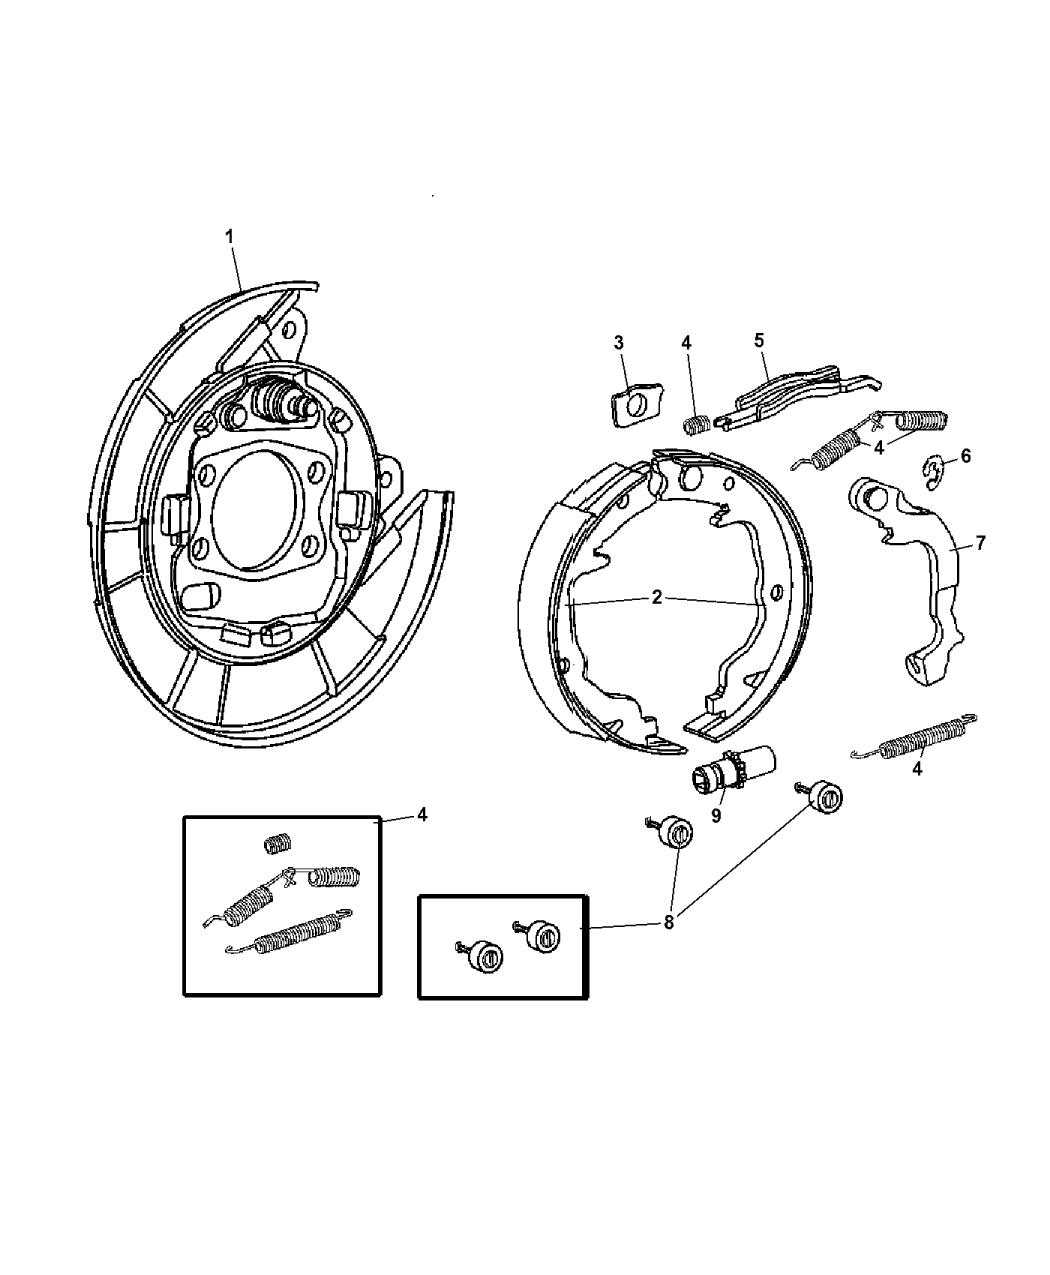 Ford Taurus Drum Brake Diagram